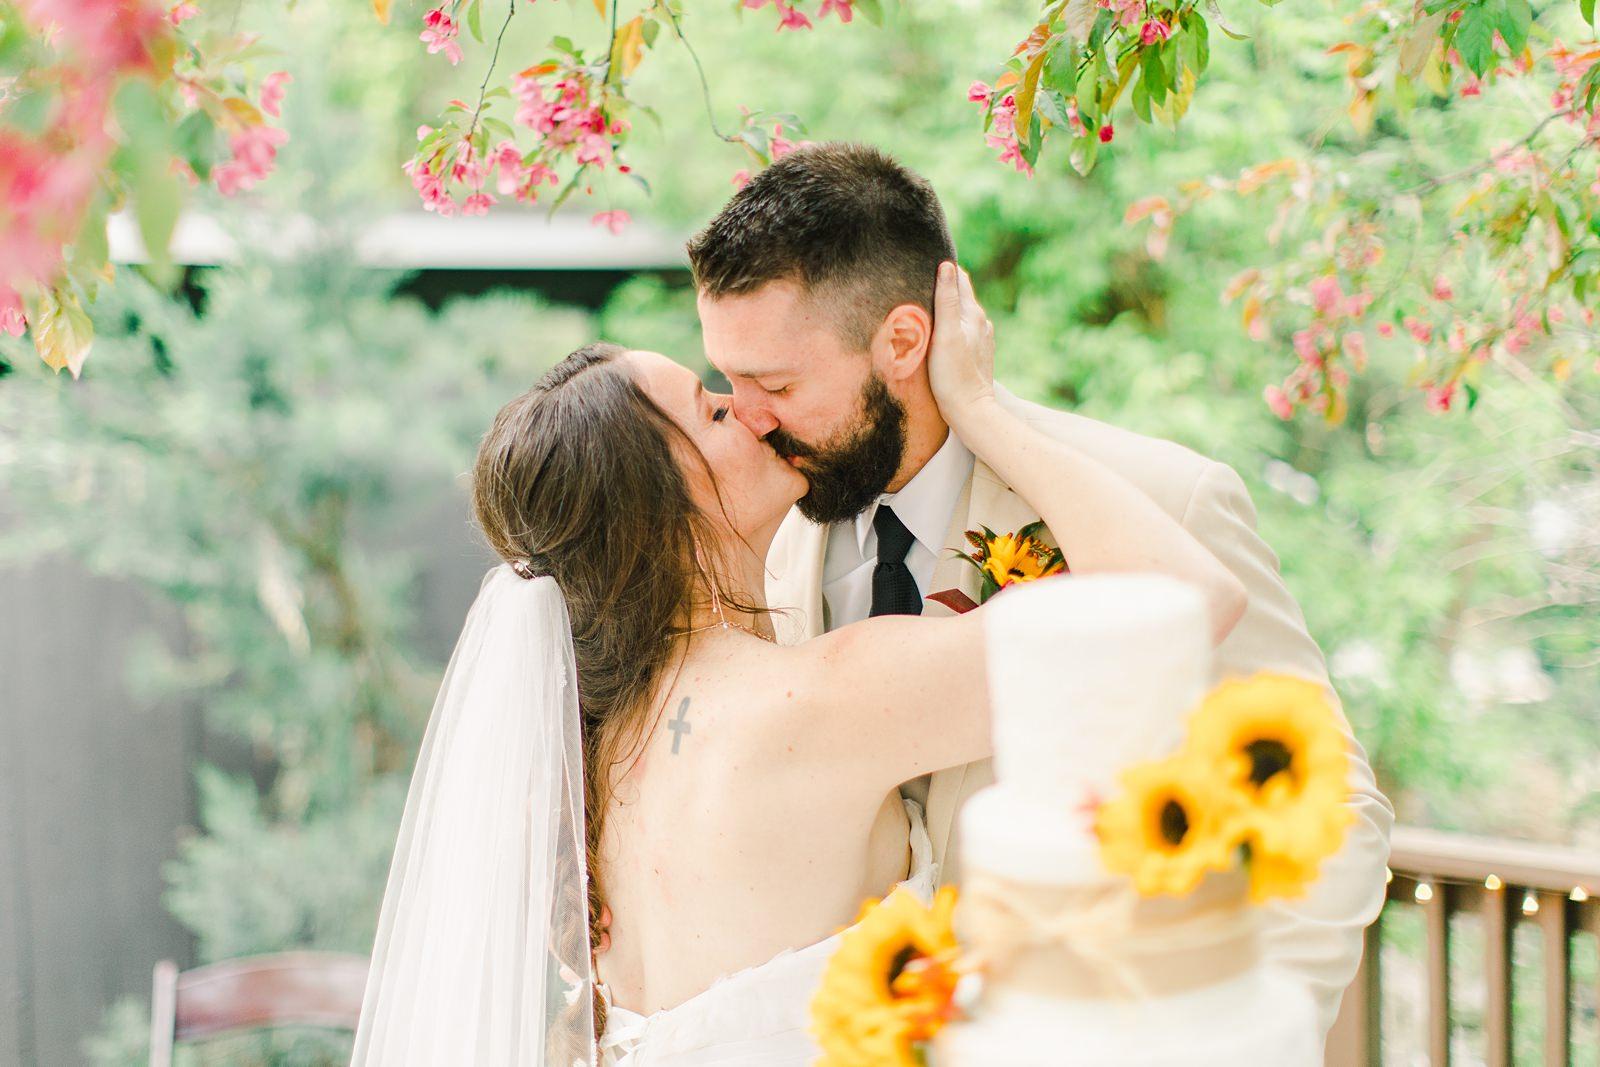 Millcreek Inn Summer Wedding, Utah wedding photography Millcreek Canyon, Salt Lake City, bride and groom kiss